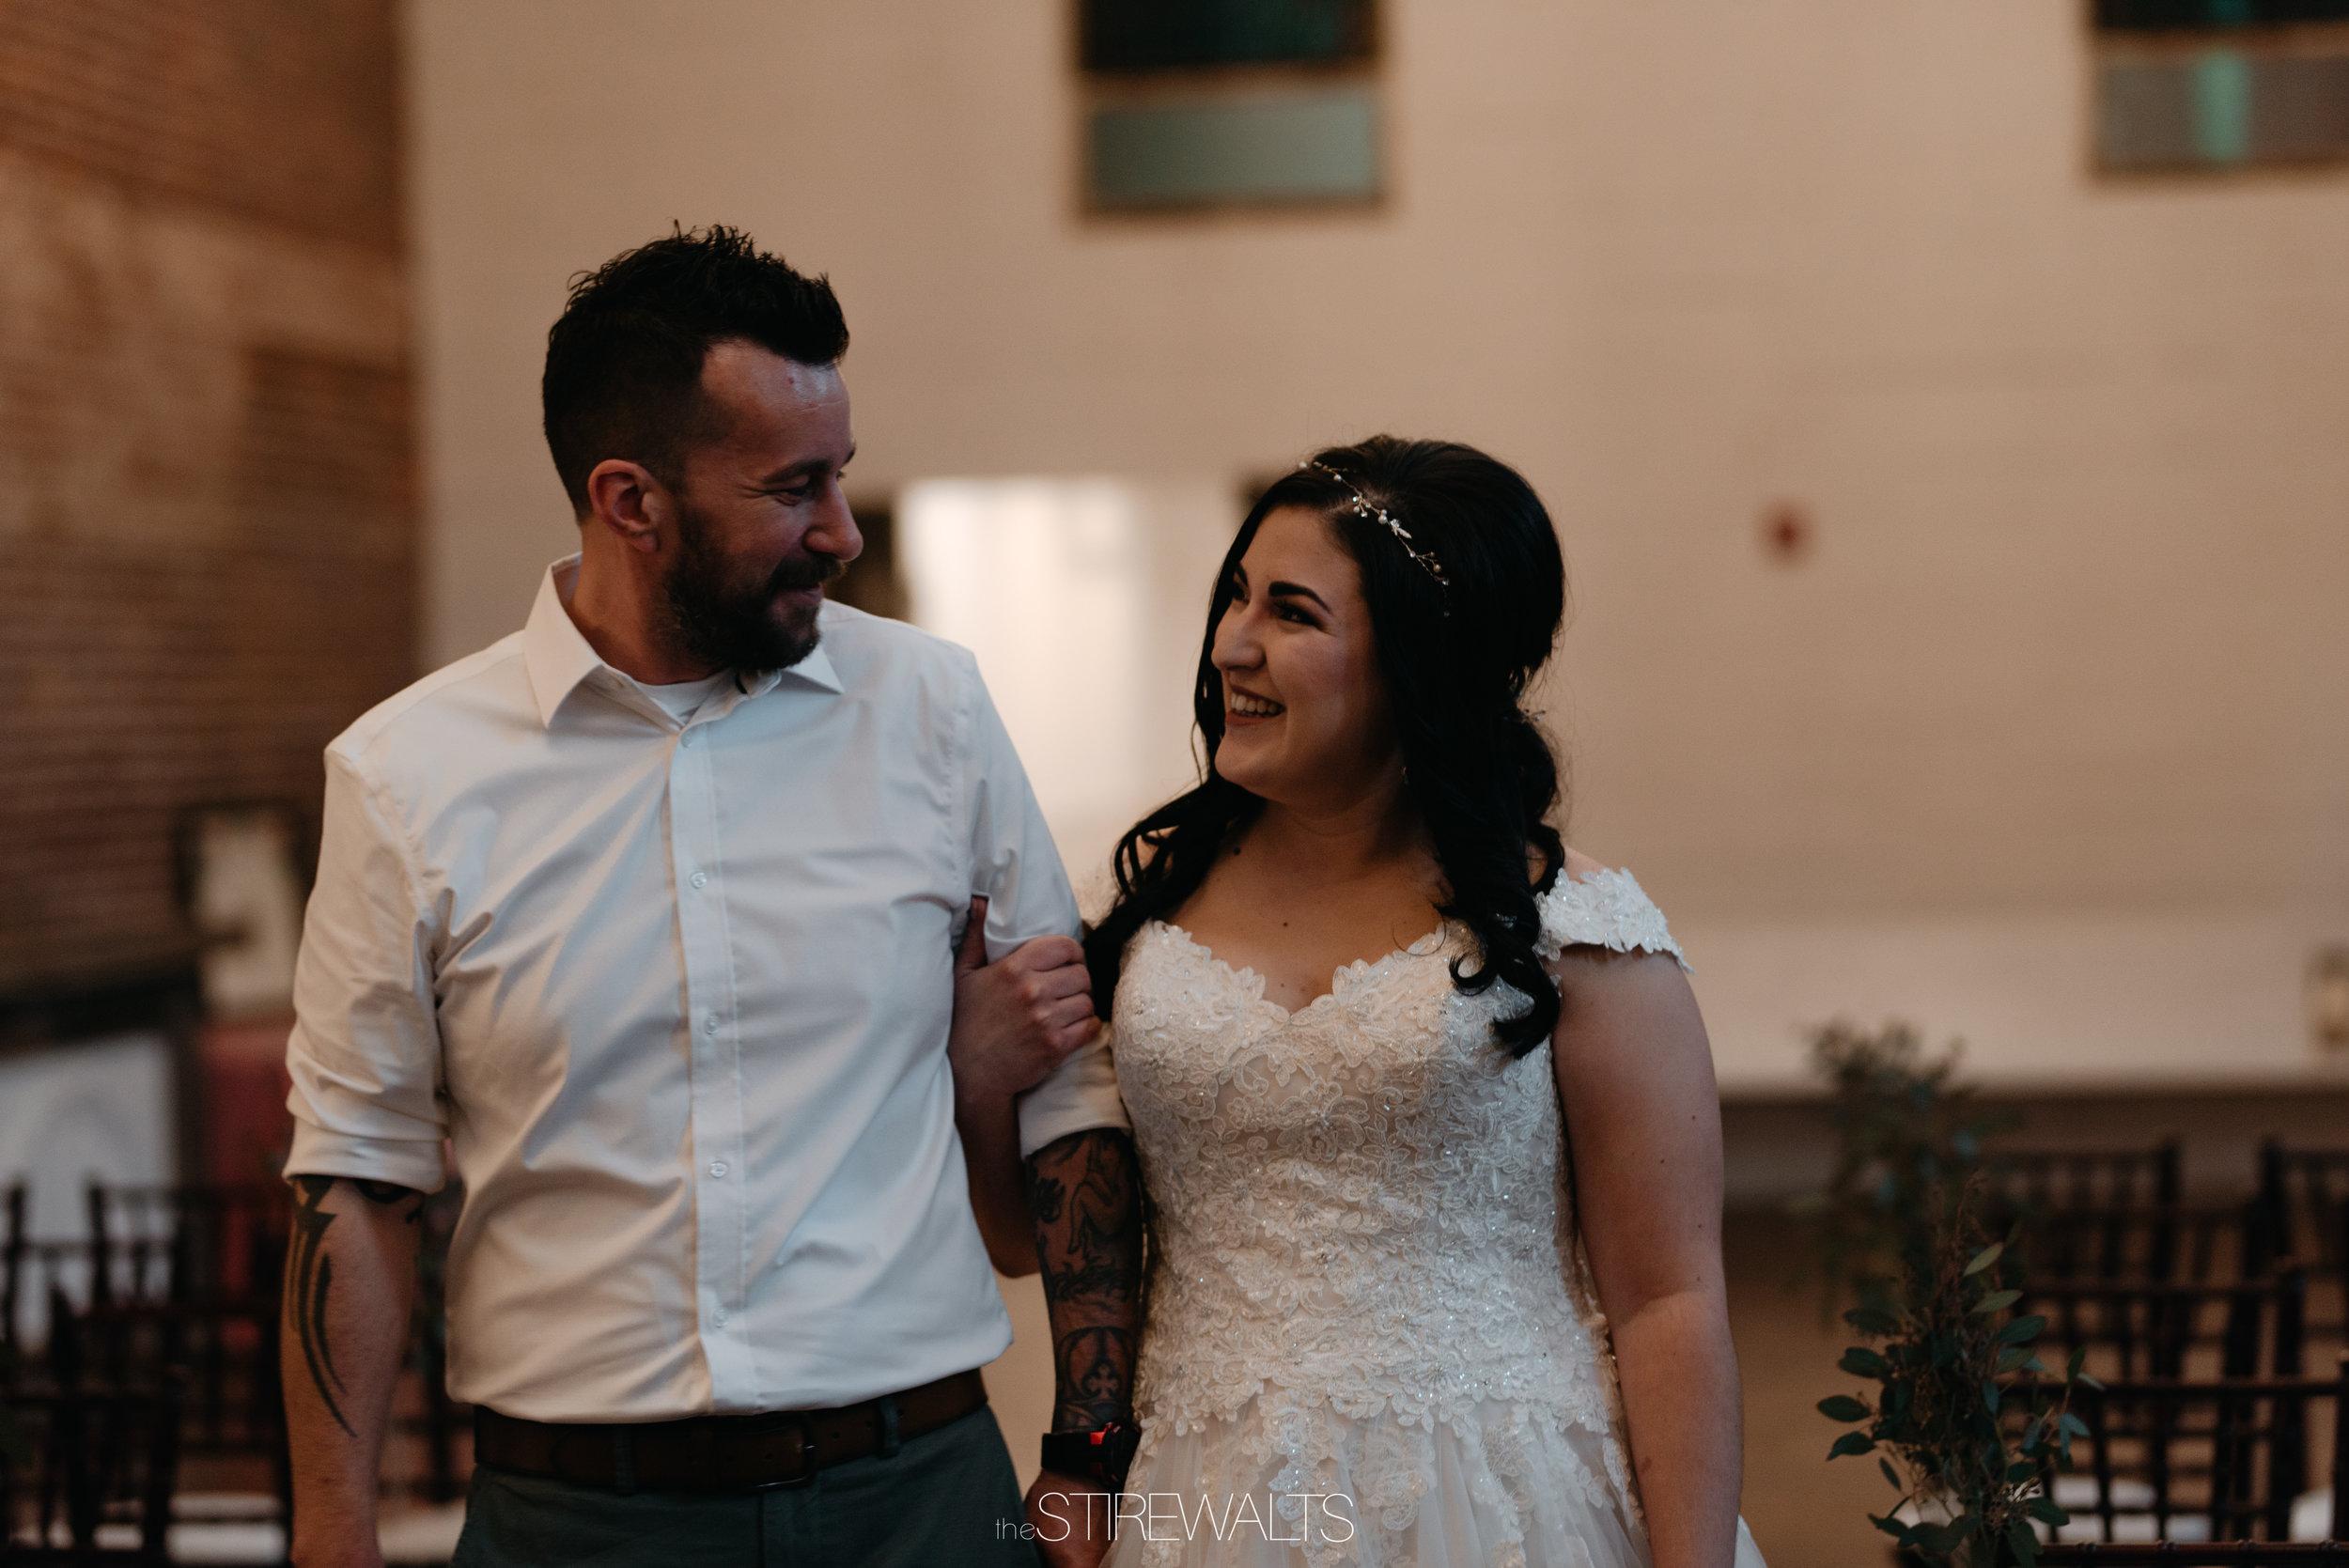 Sara.Jon.Wedding.Blog.2018.©TheStirewalts-31.jpg